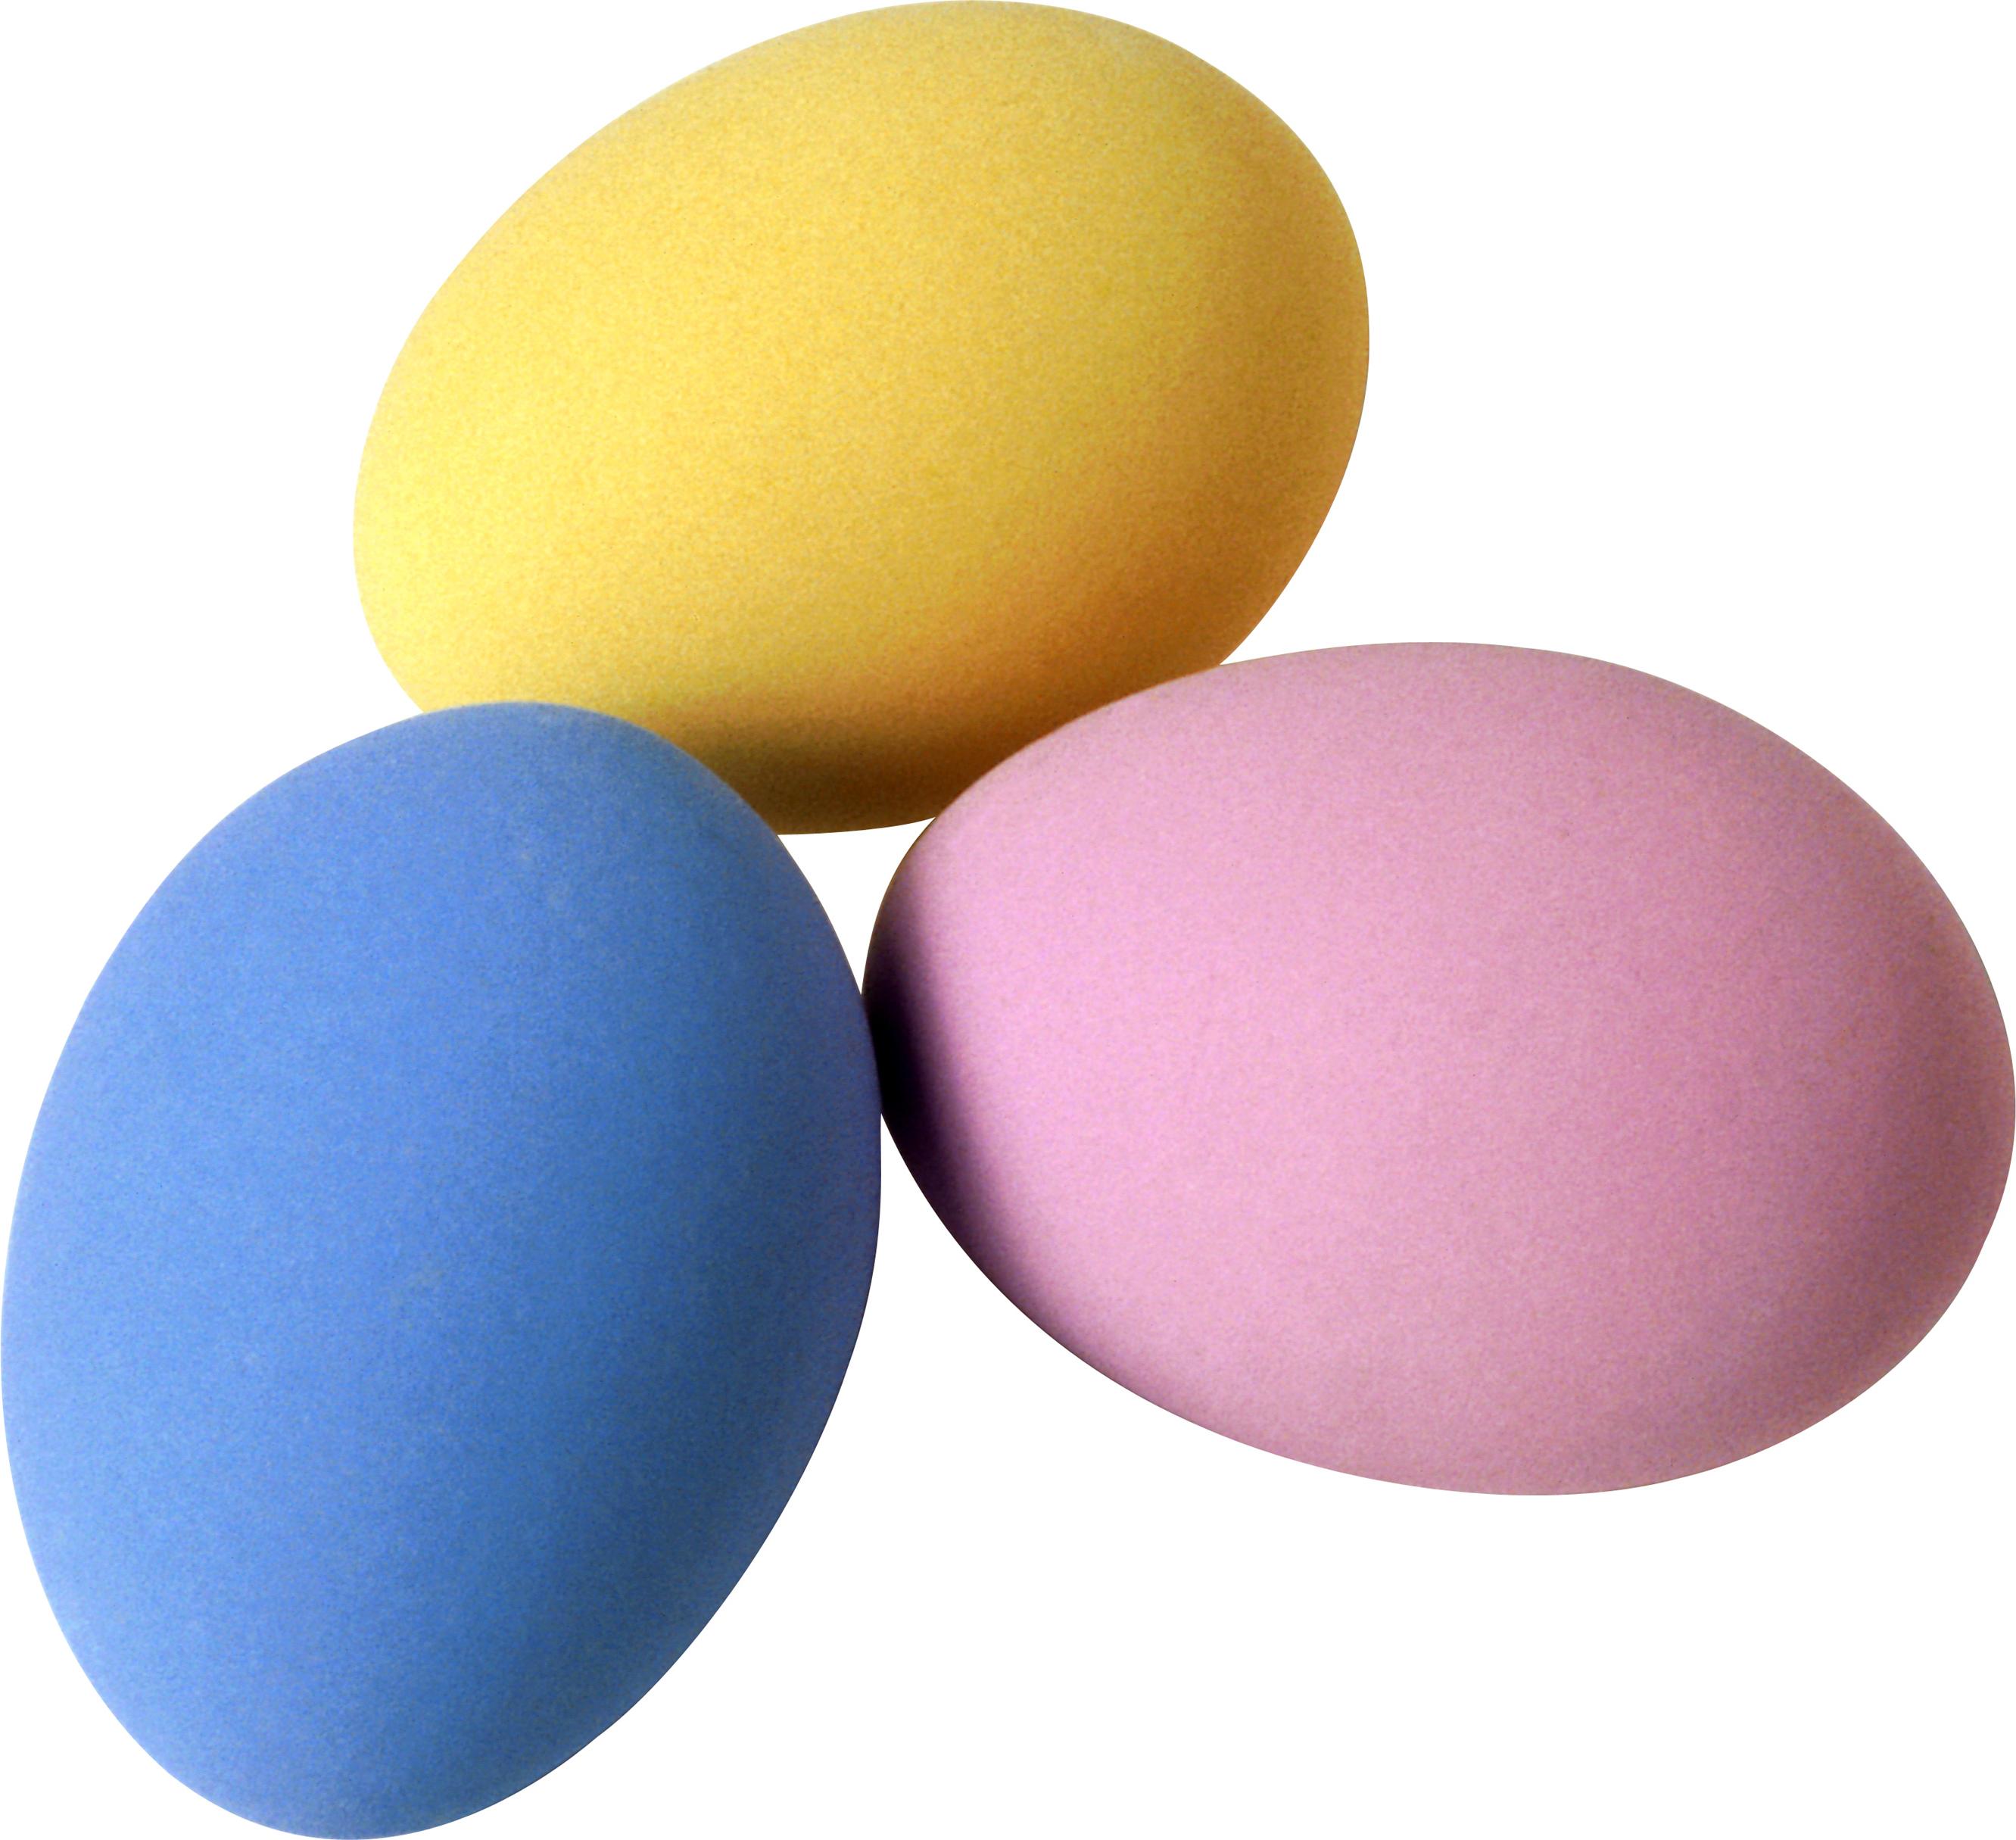 крашеные яйца PNG фото